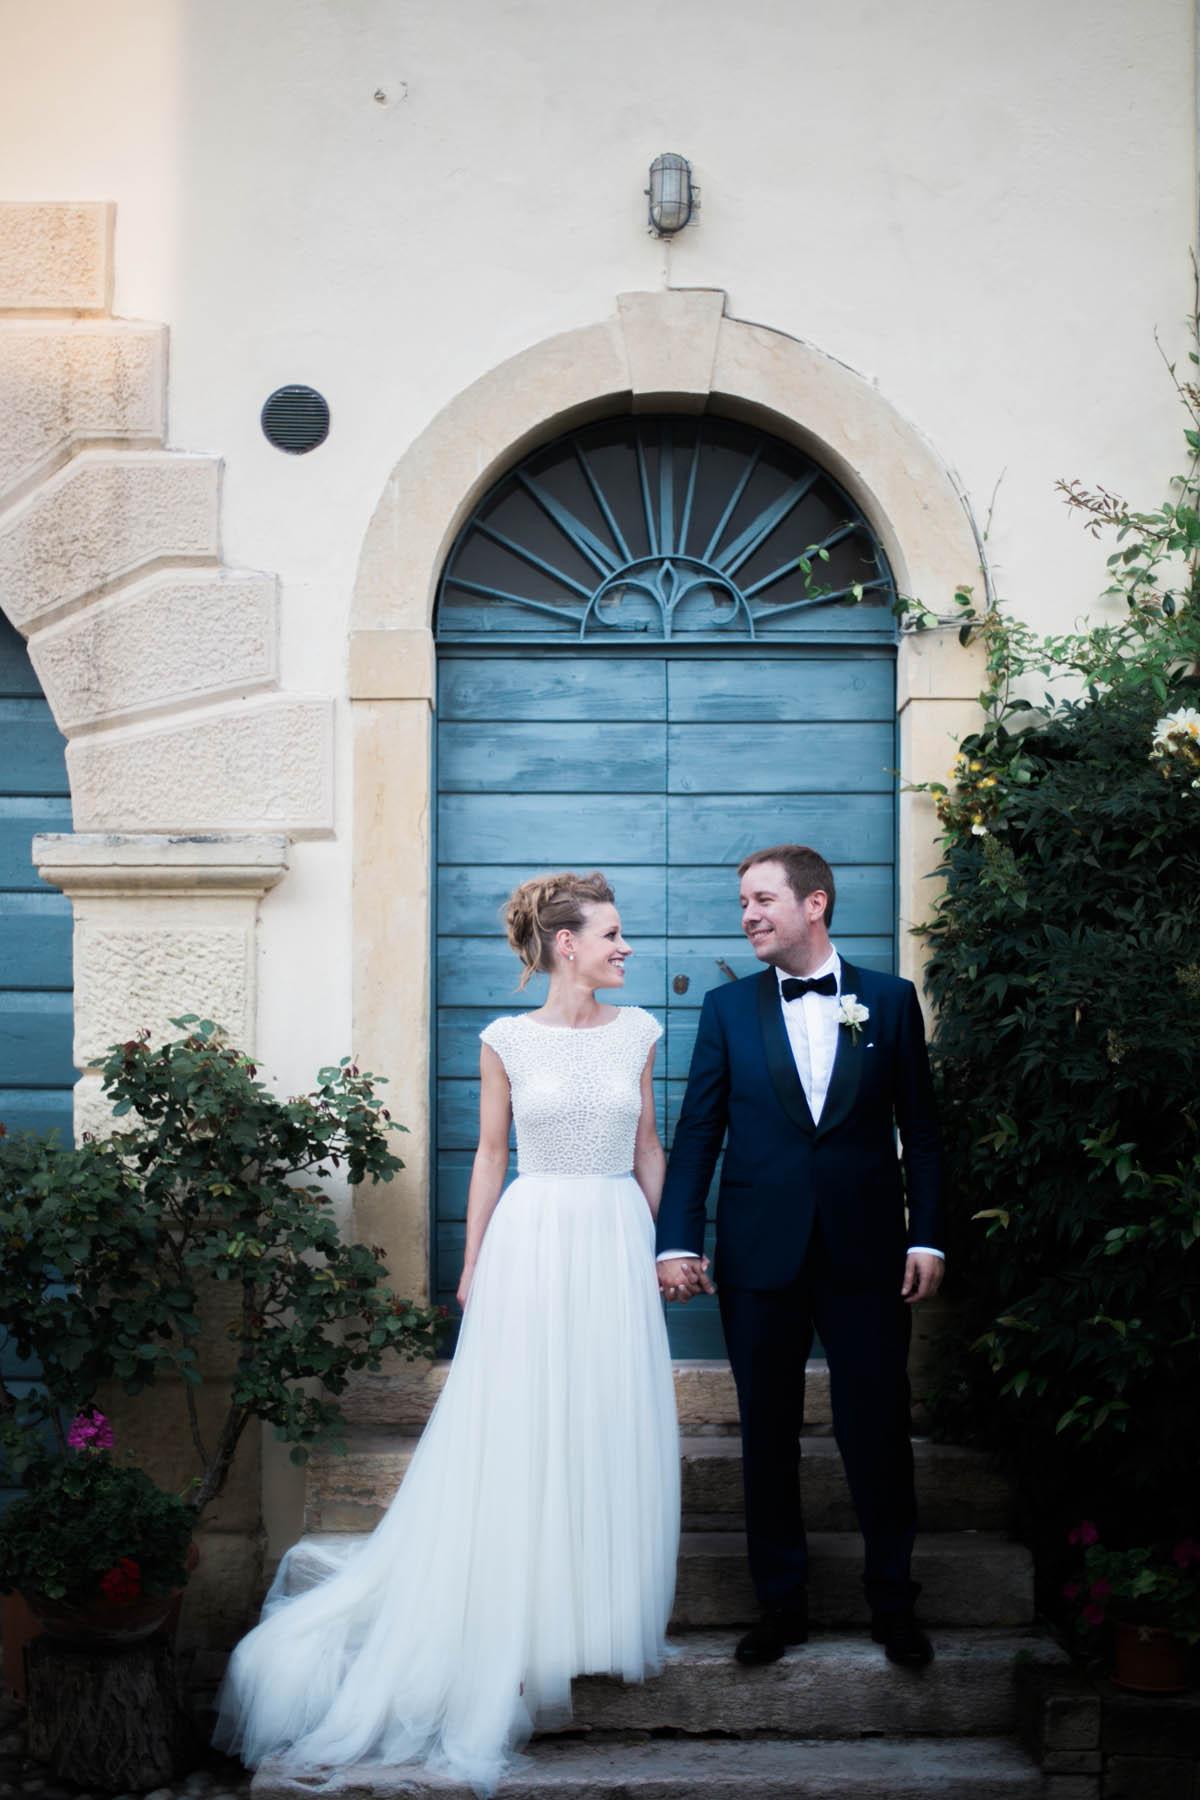 matrimonio ispirato a new york